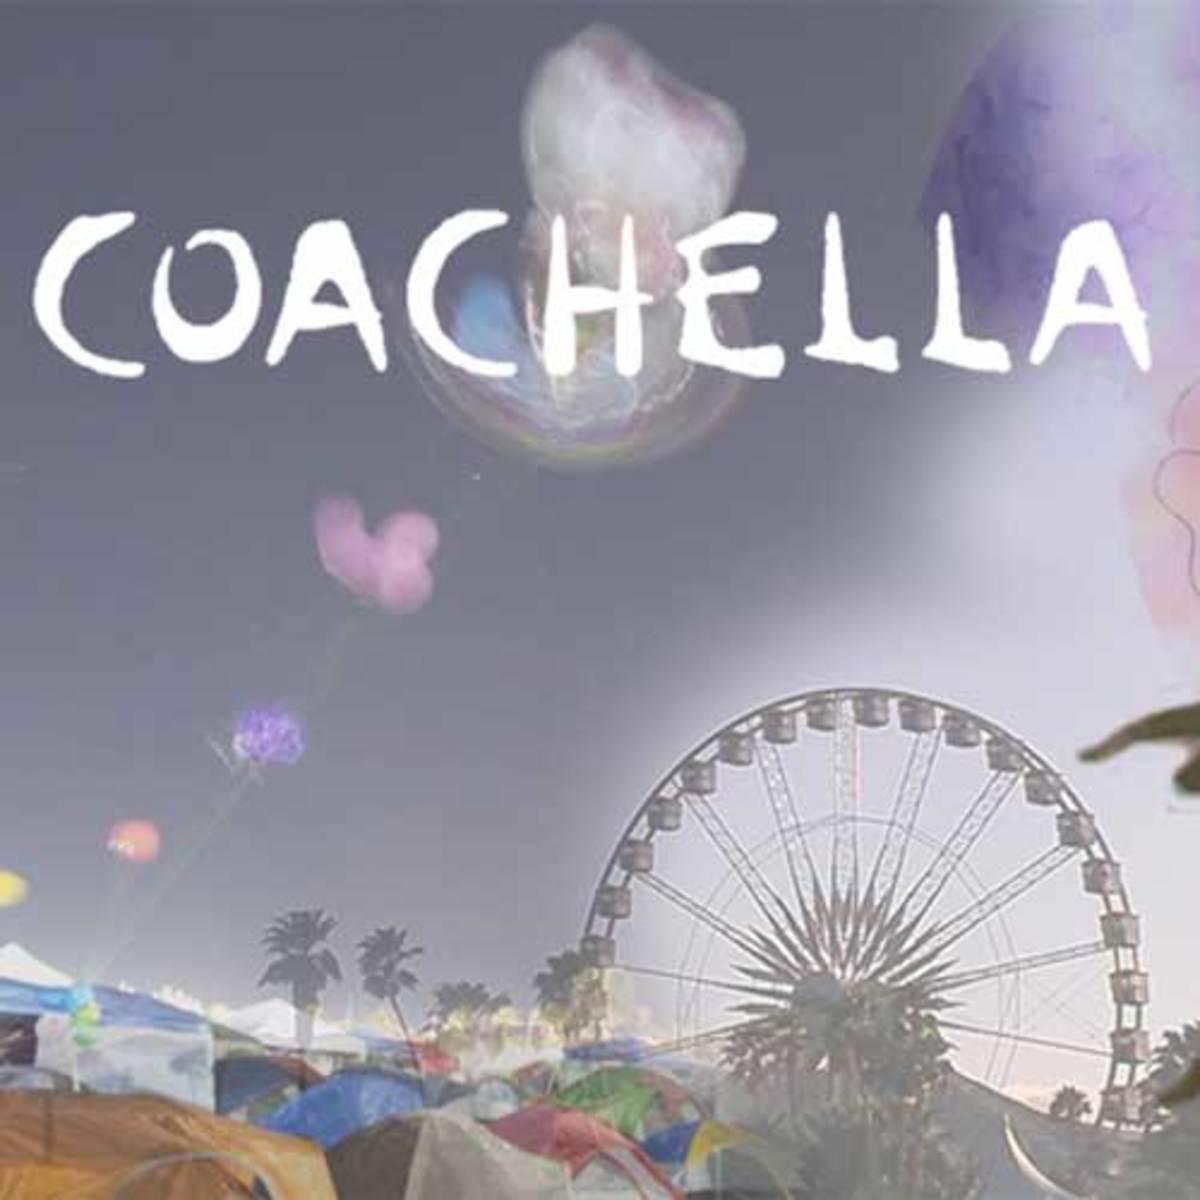 coachella-new.jpg